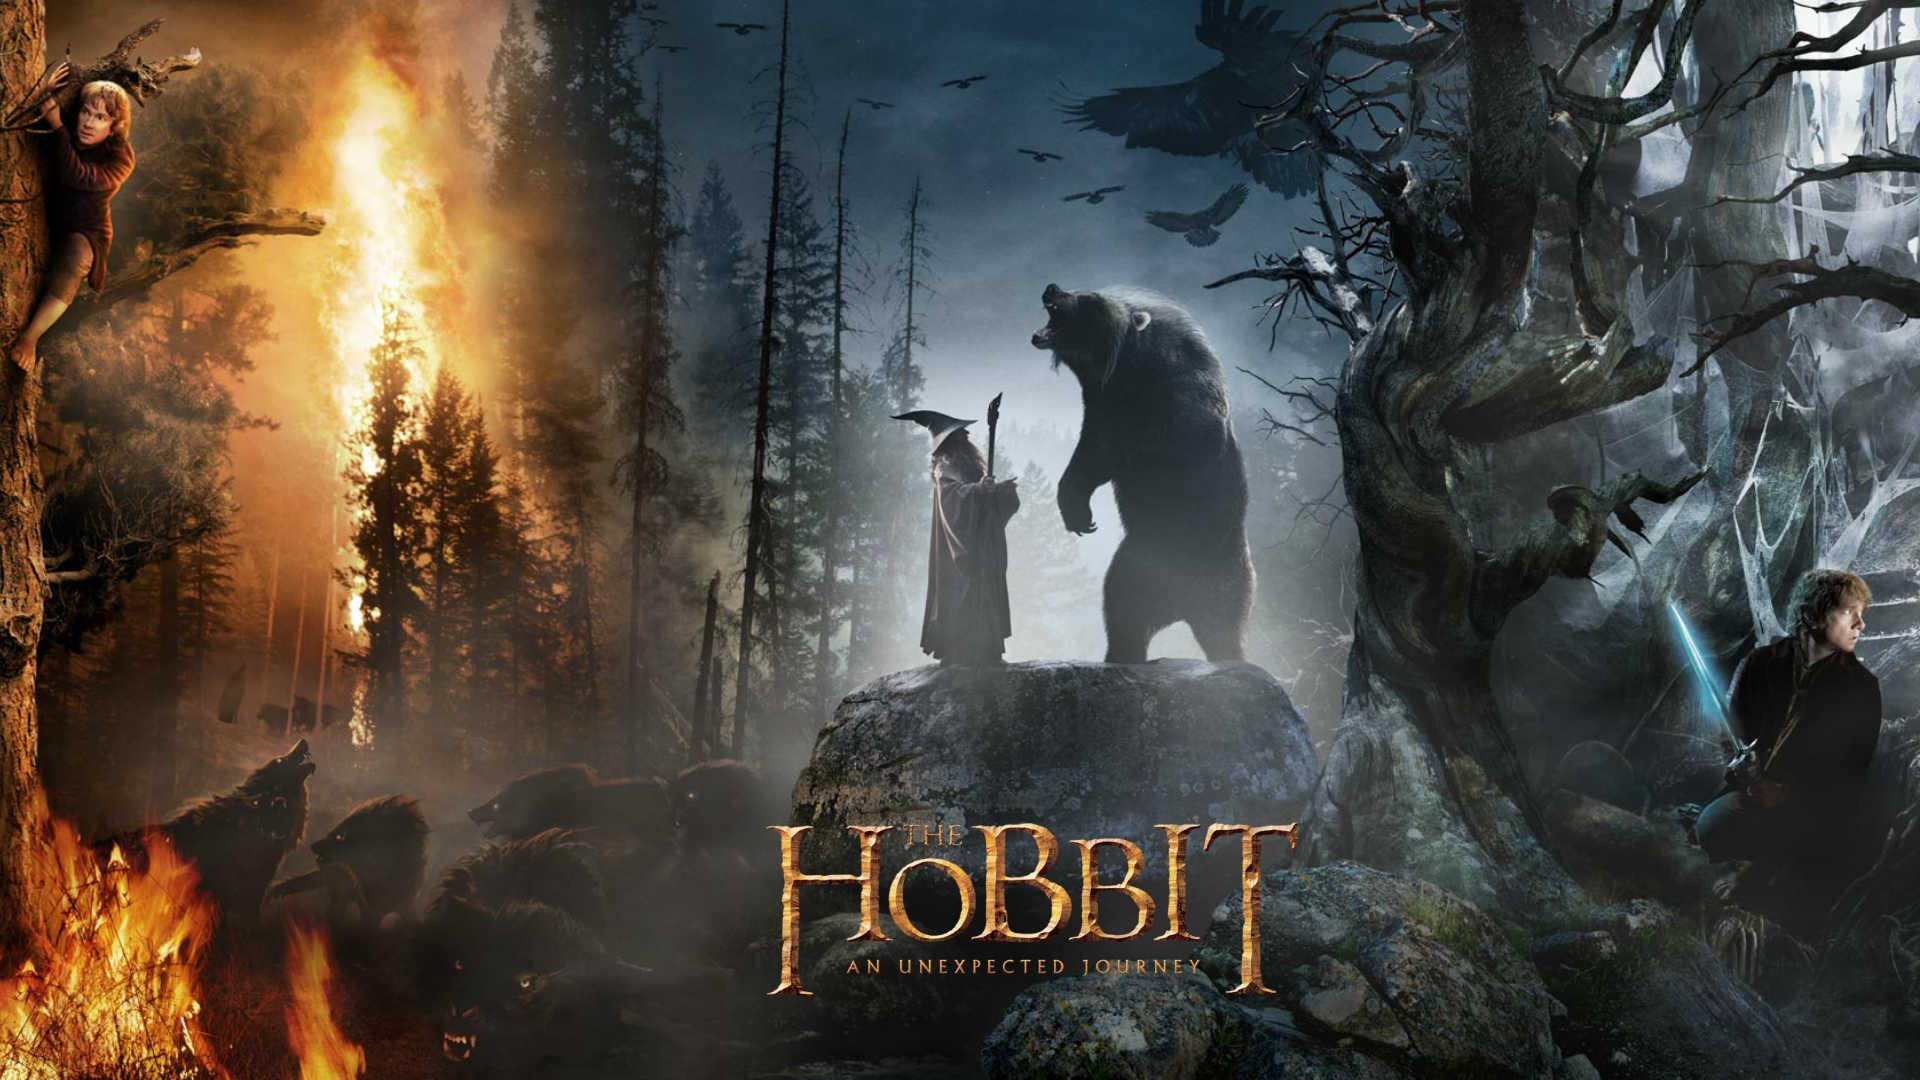 The Hobbit Movie Wallpaper 1920x1080